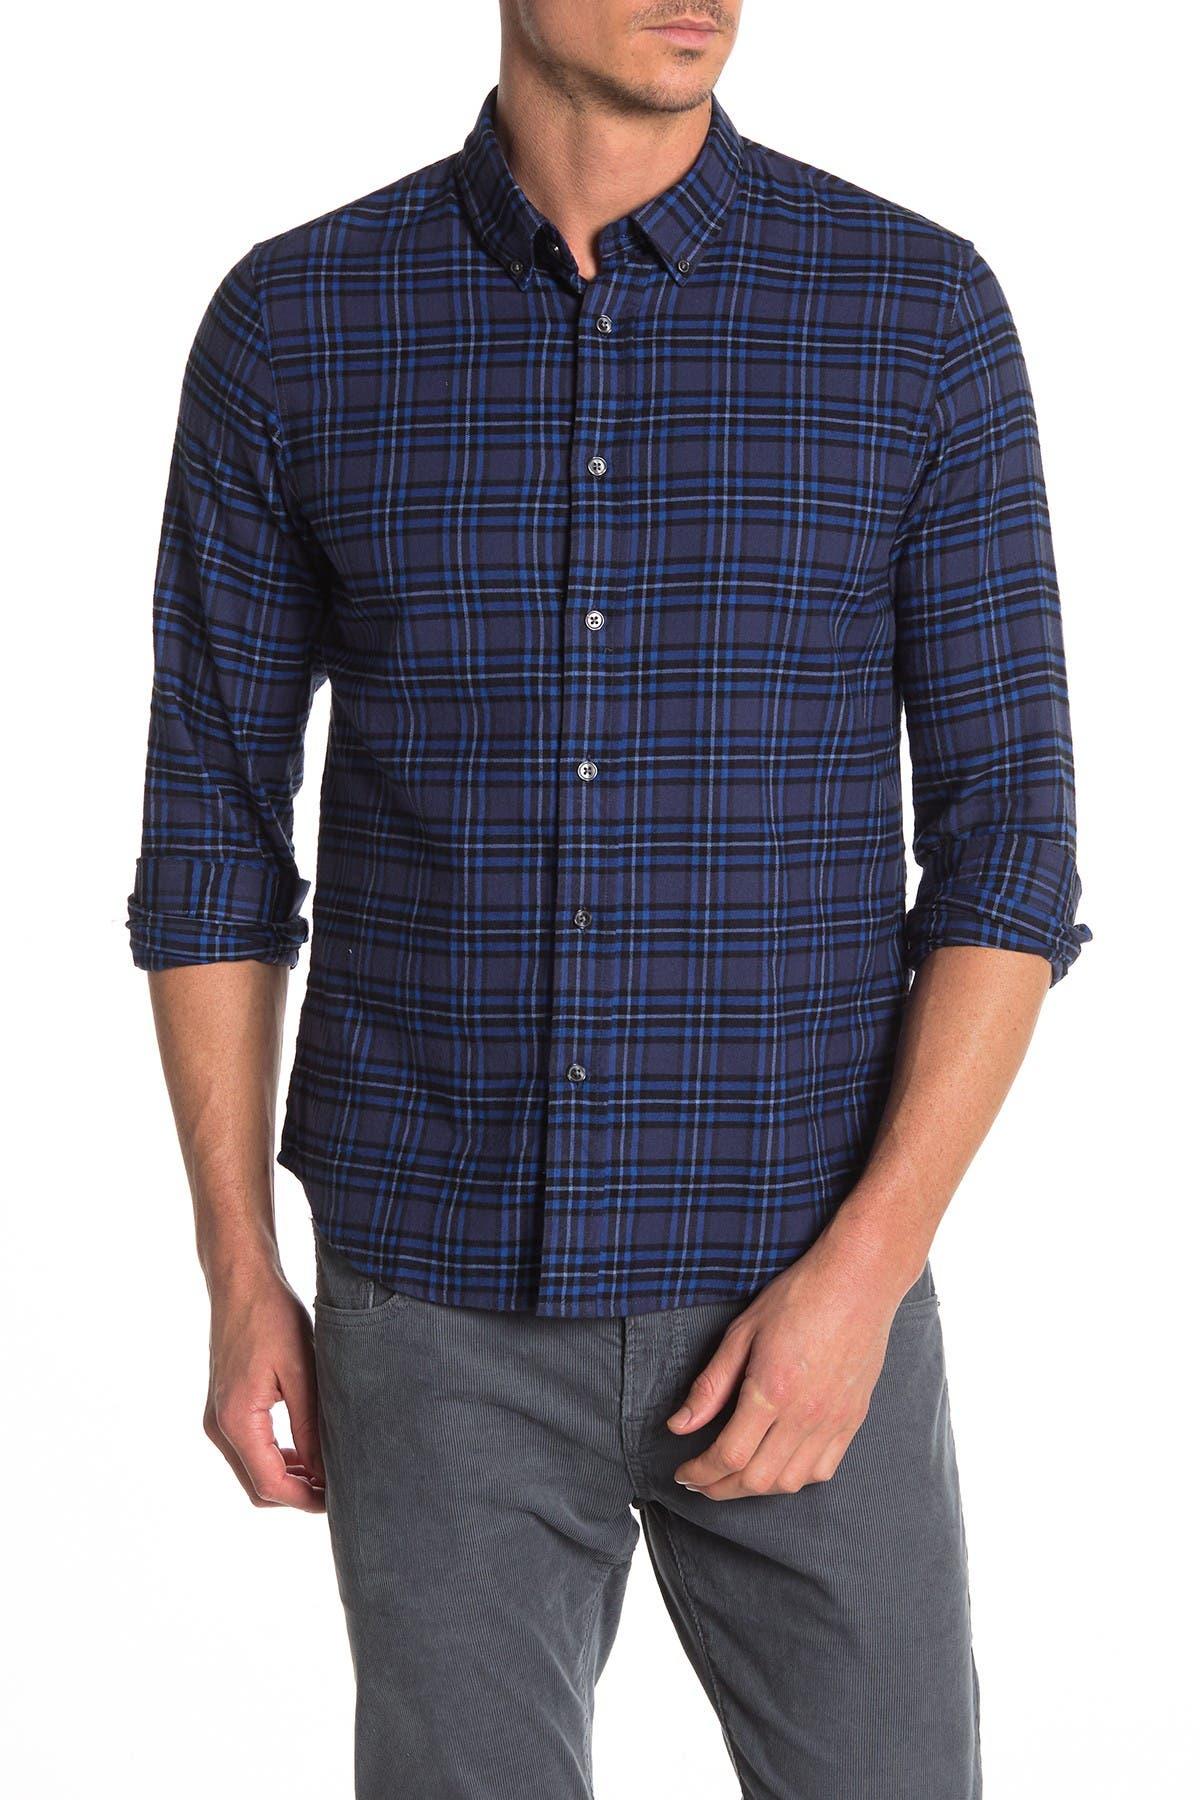 Image of Slate & Stone Plaid Printed Shirt